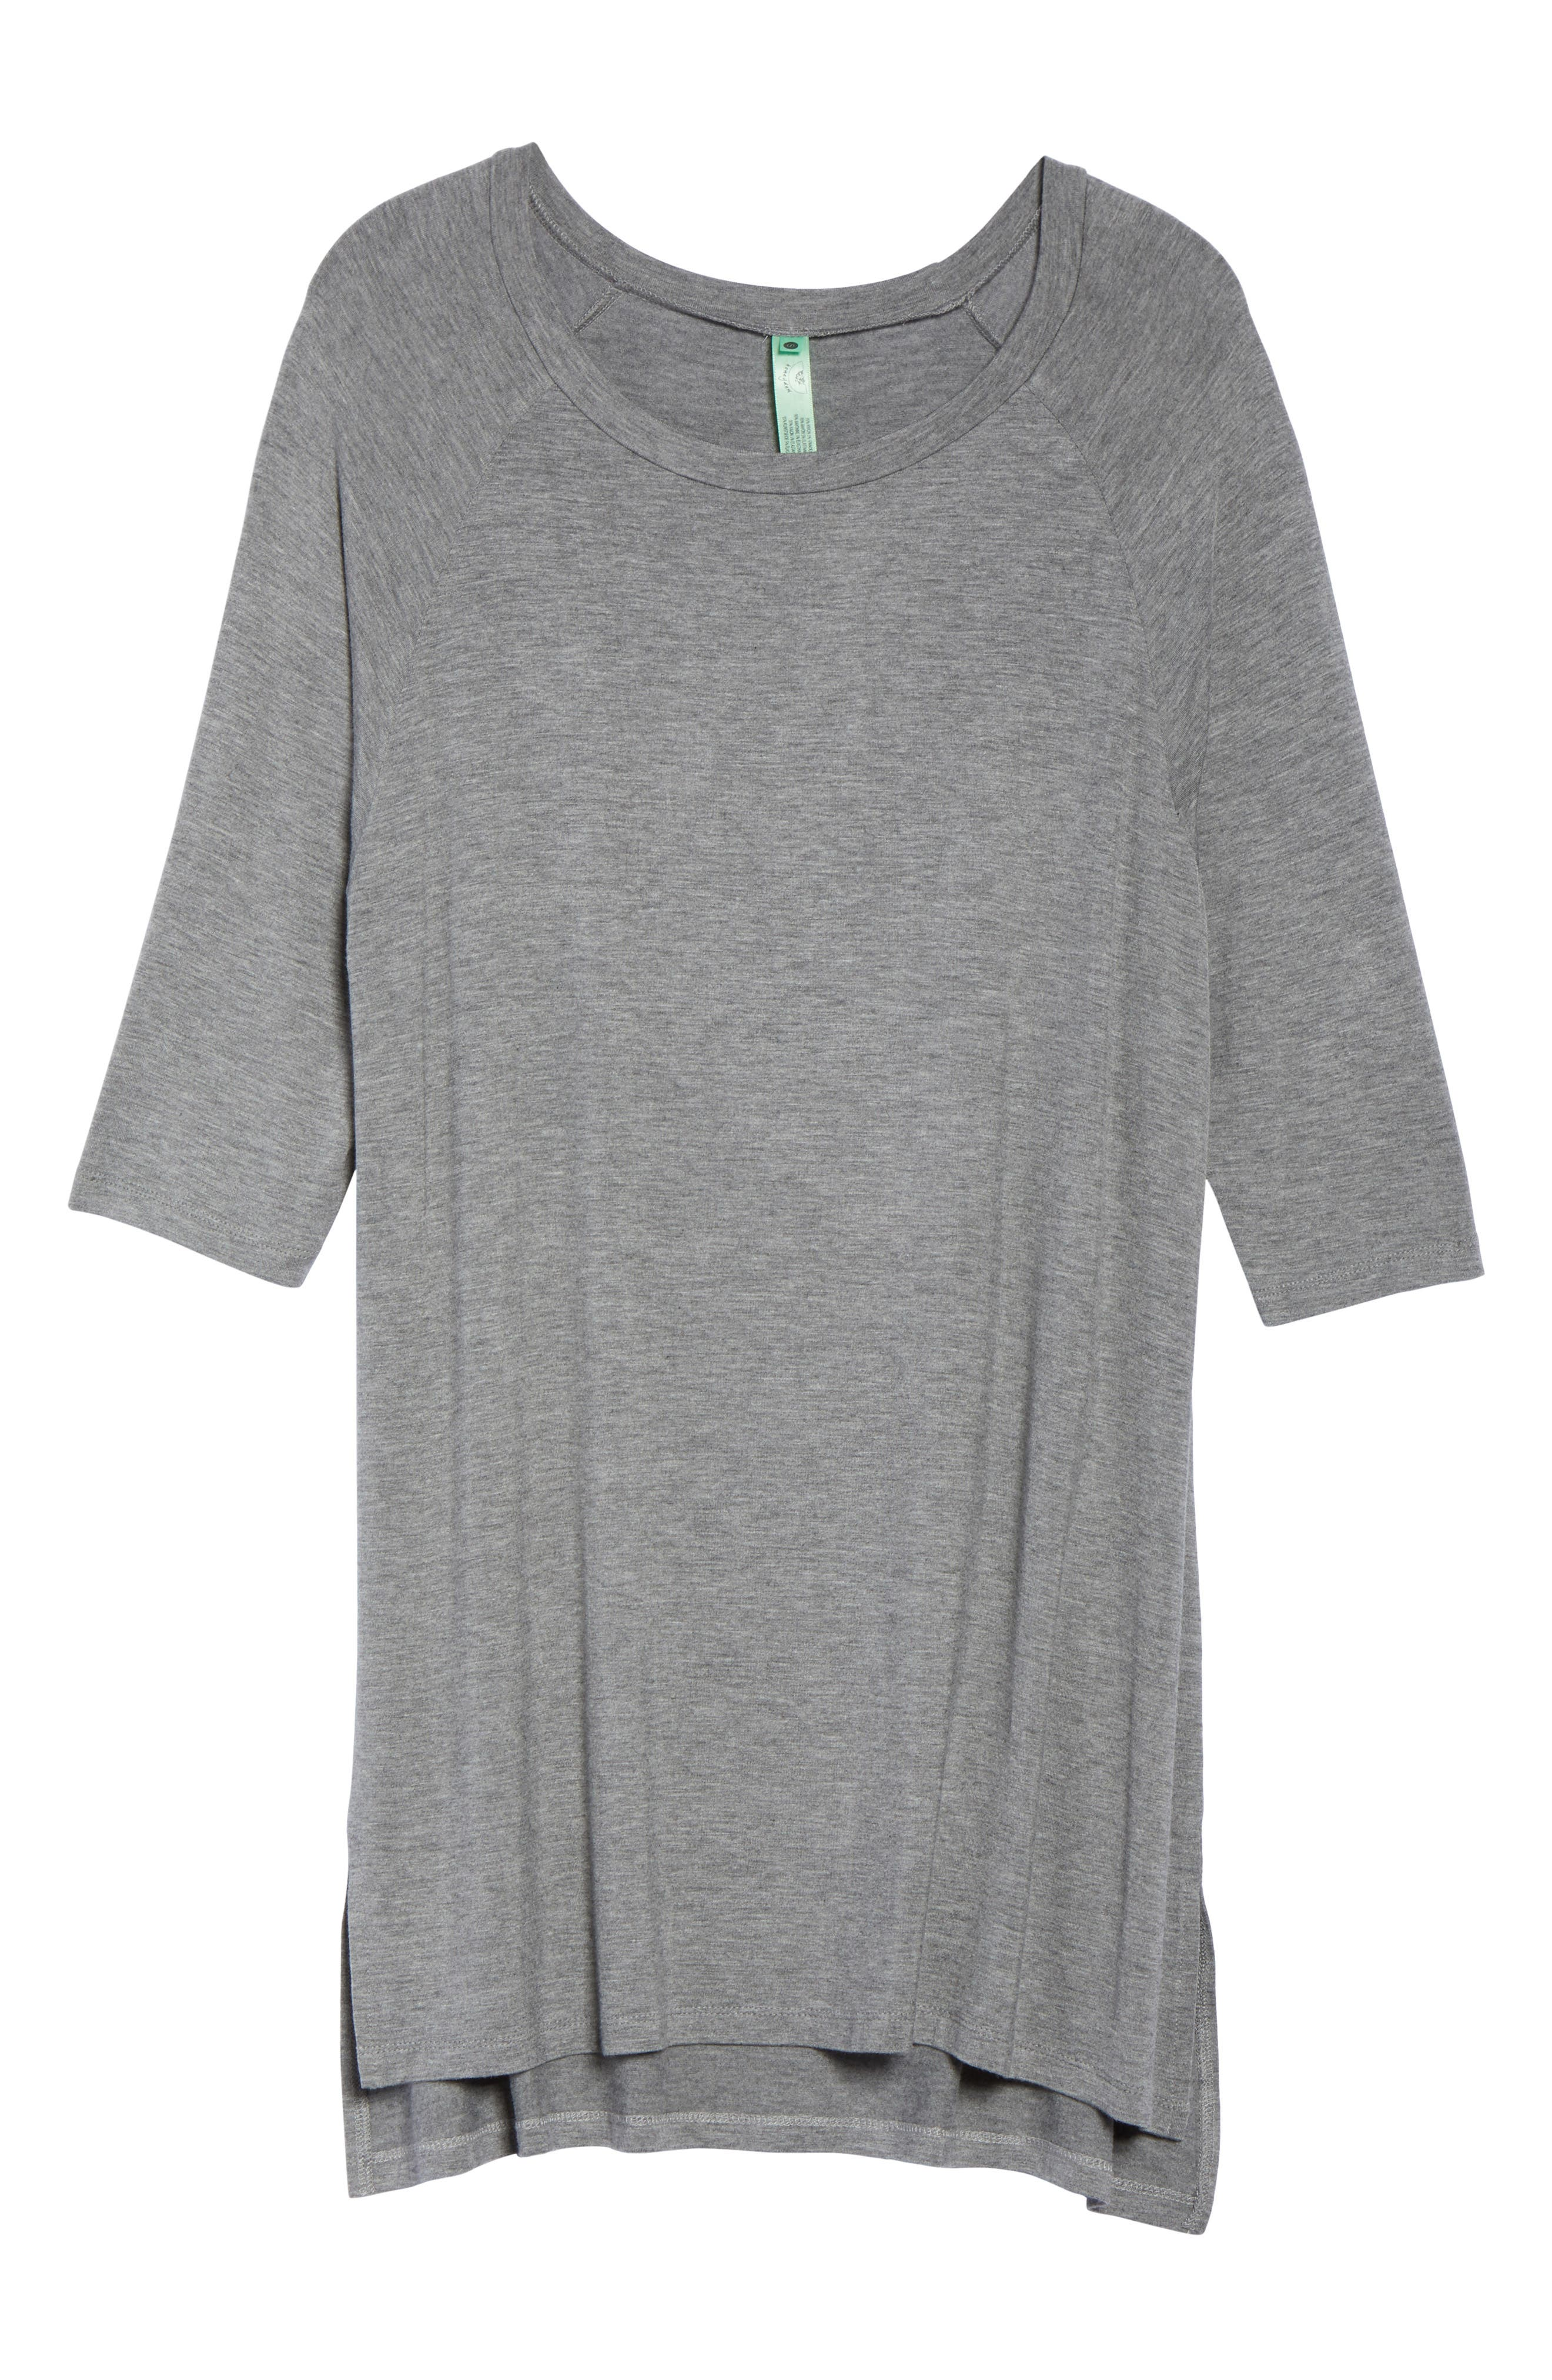 Honeydew All American Sleep Shirt,                             Alternate thumbnail 37, color,